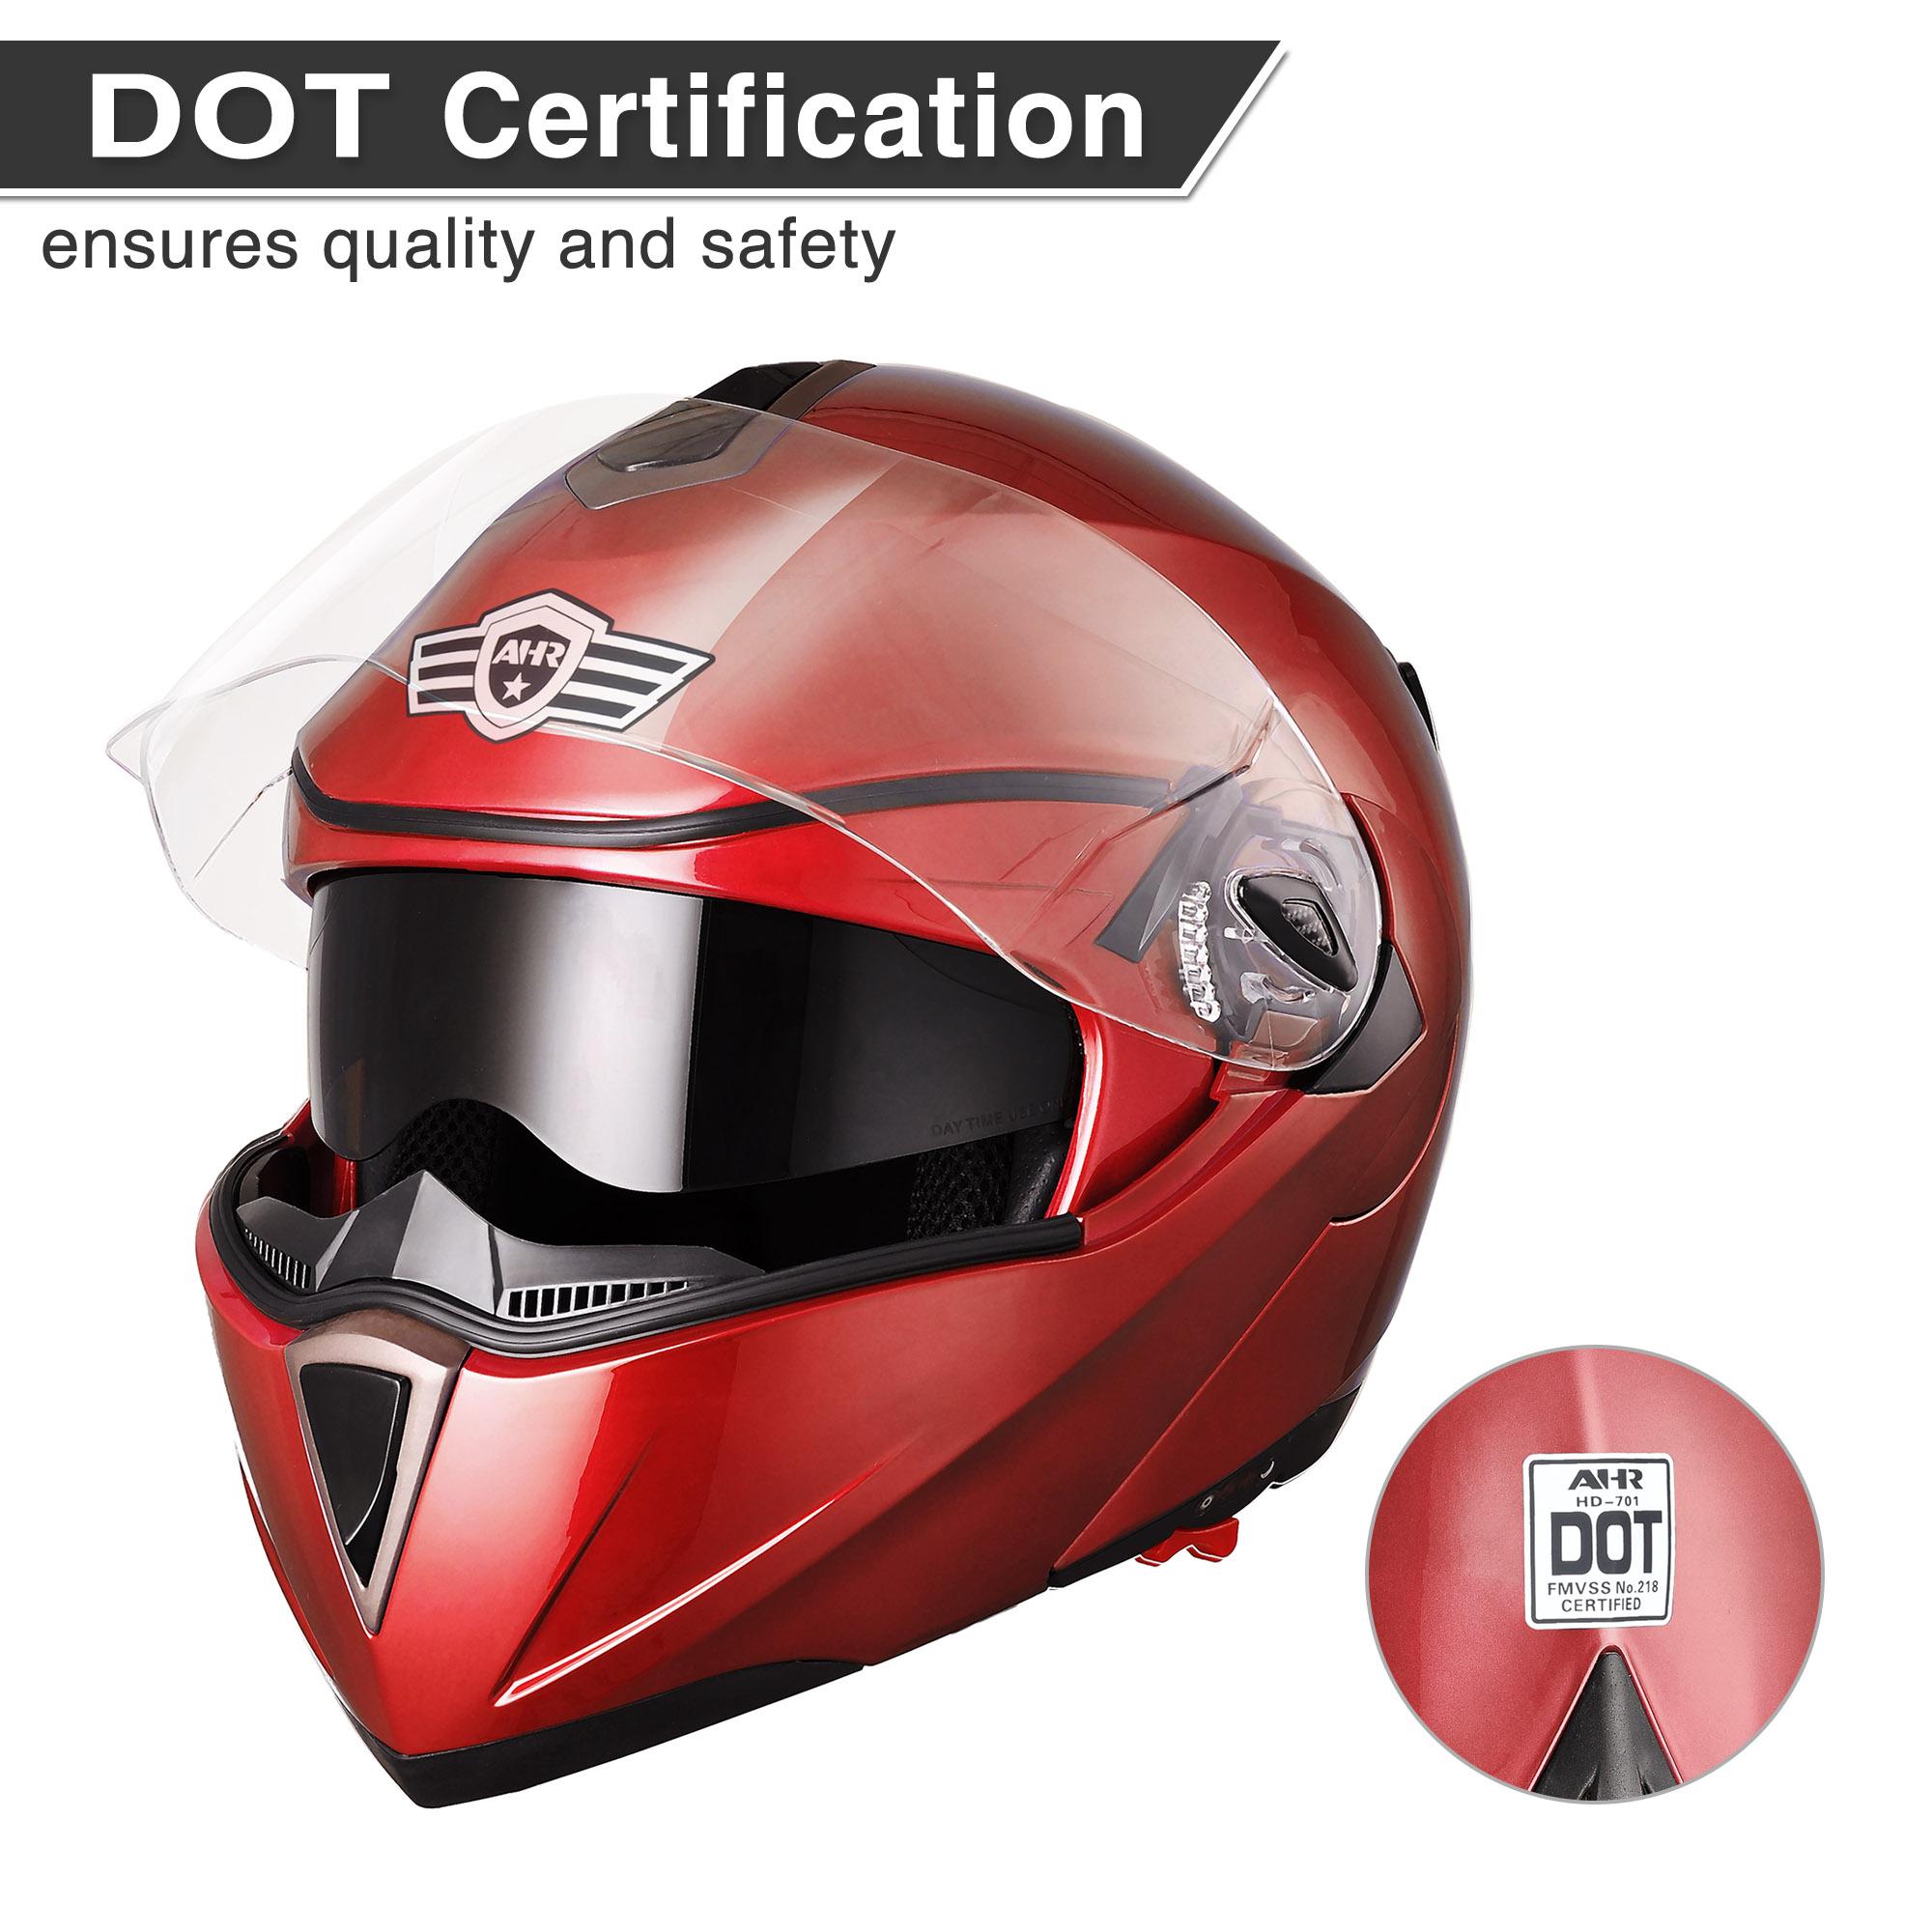 miniature 108 - DOT Flip up Modular Full Face Motorcycle Helmet Dual Visor Motocross Size Opt